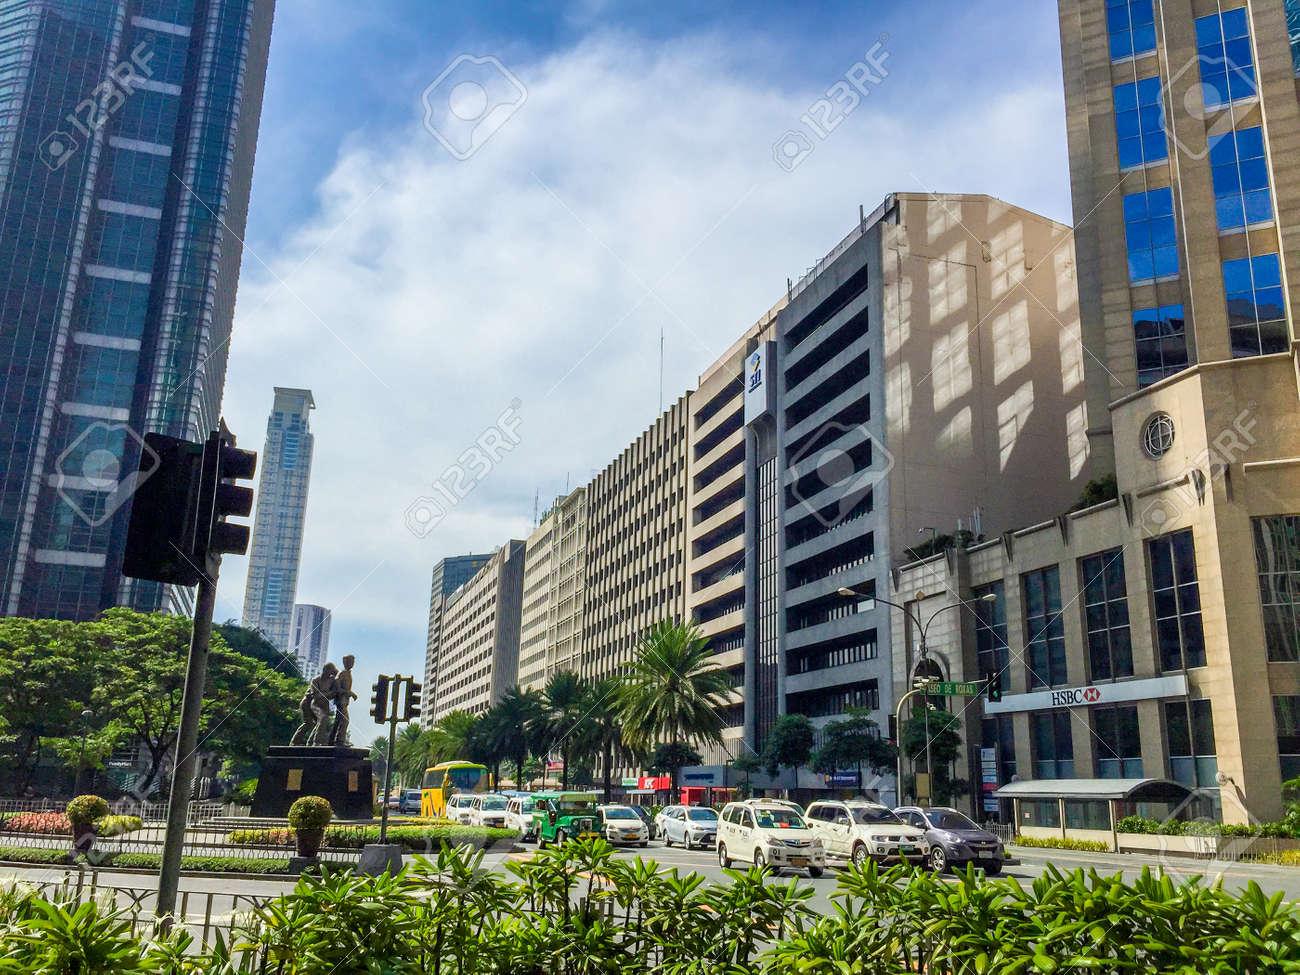 Makati, Philippines - July 19, 2015 : Makati city, Manila  Makati